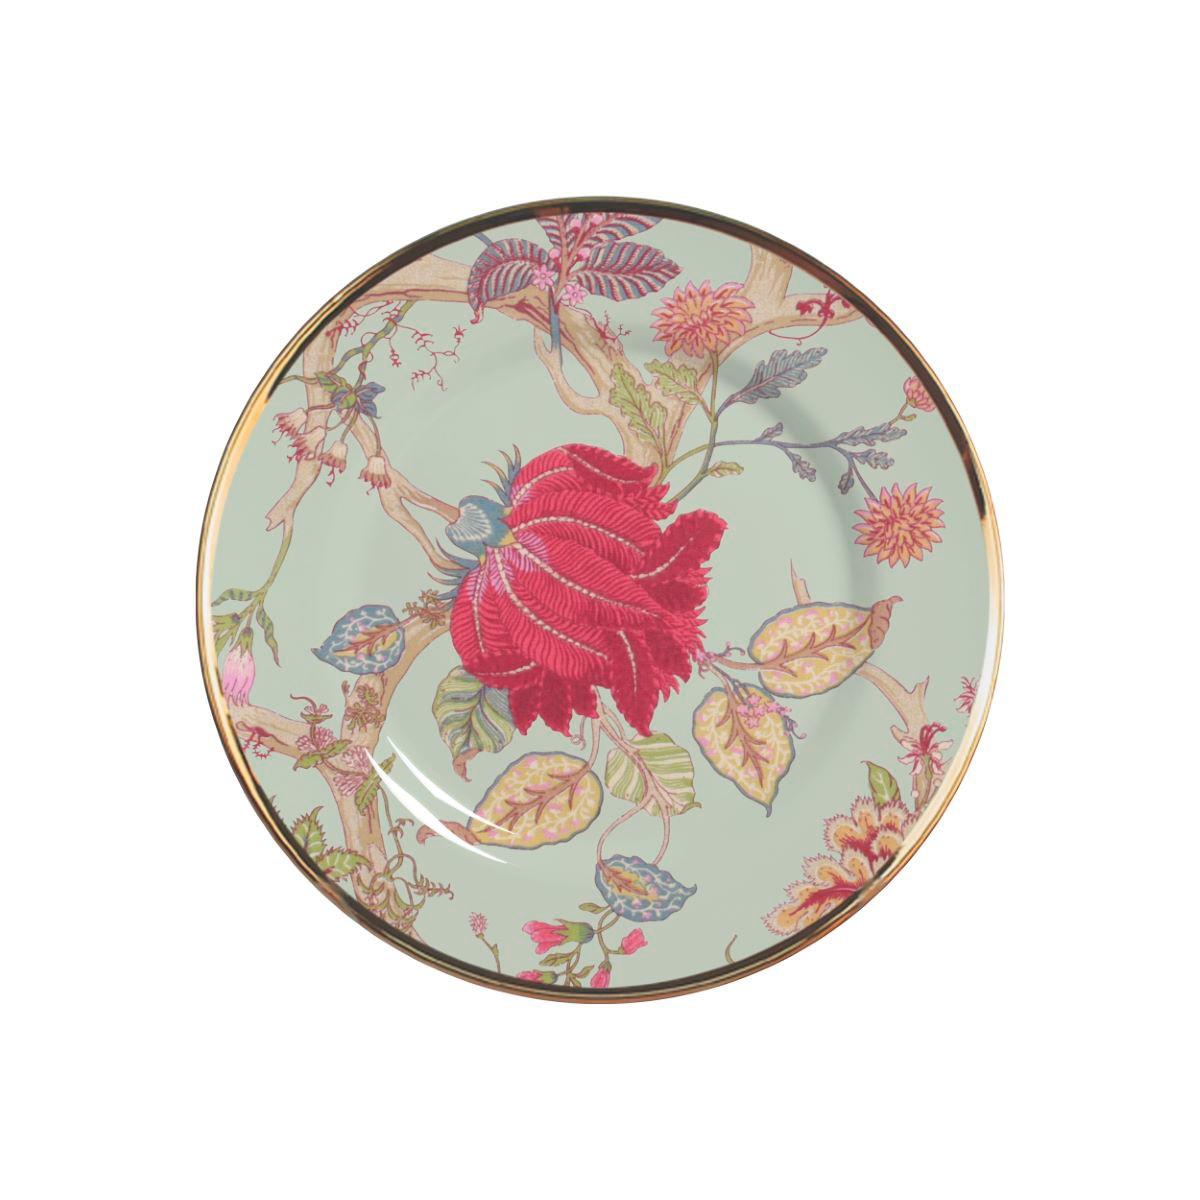 Prato Sobremesa Neomint Flowers Cerâmica Alleanza - 6 Peças